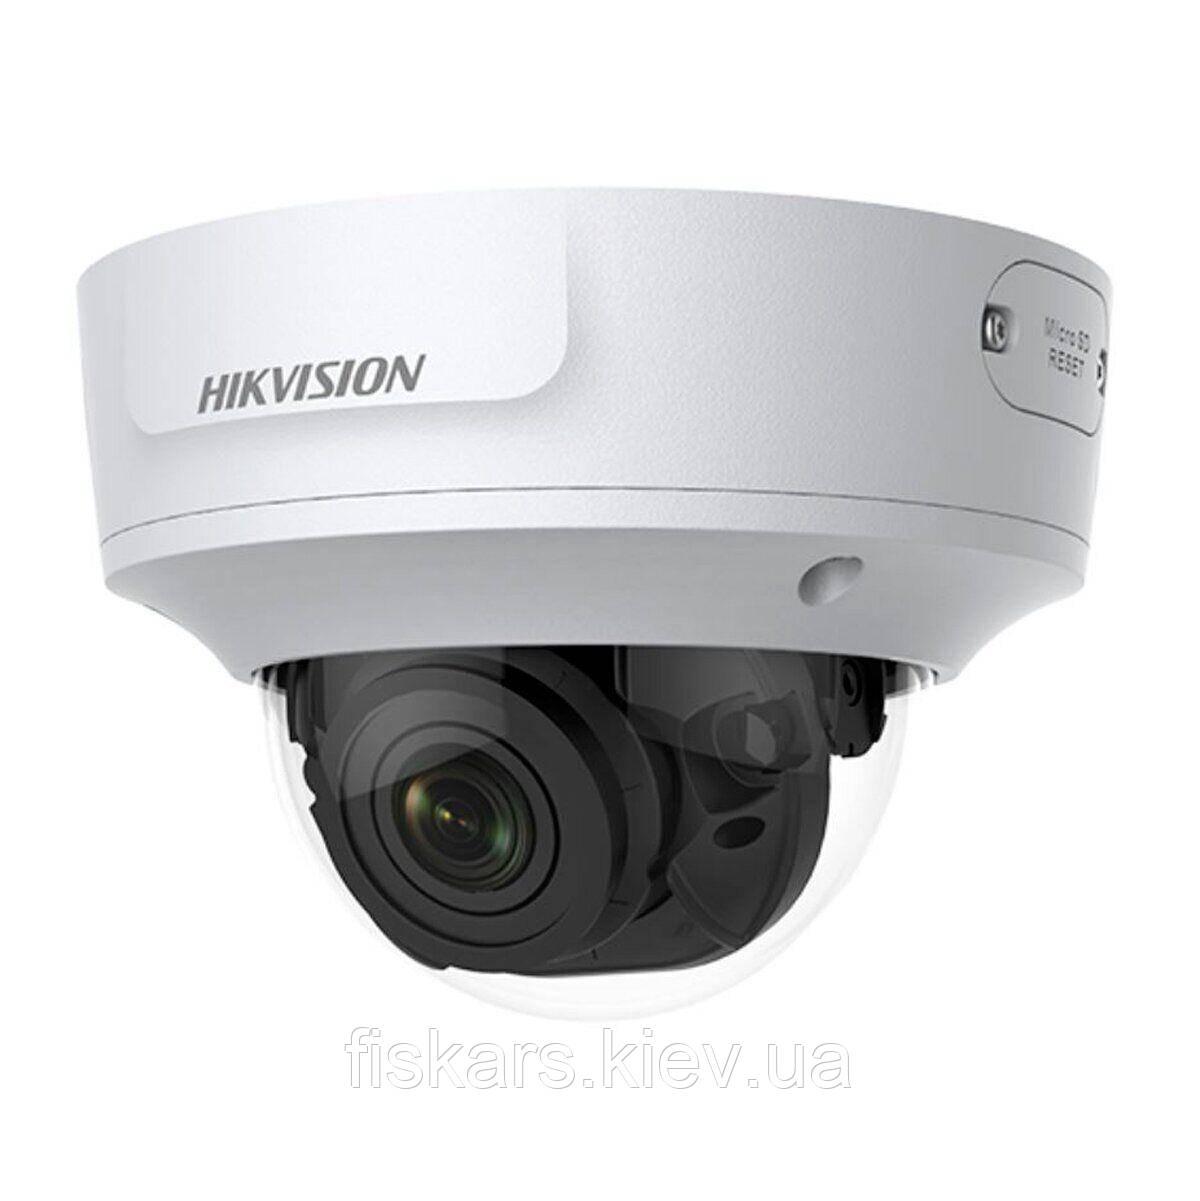 Hikvision DS-2CD2783G1-IZS 8 Mп IP-видеокамера